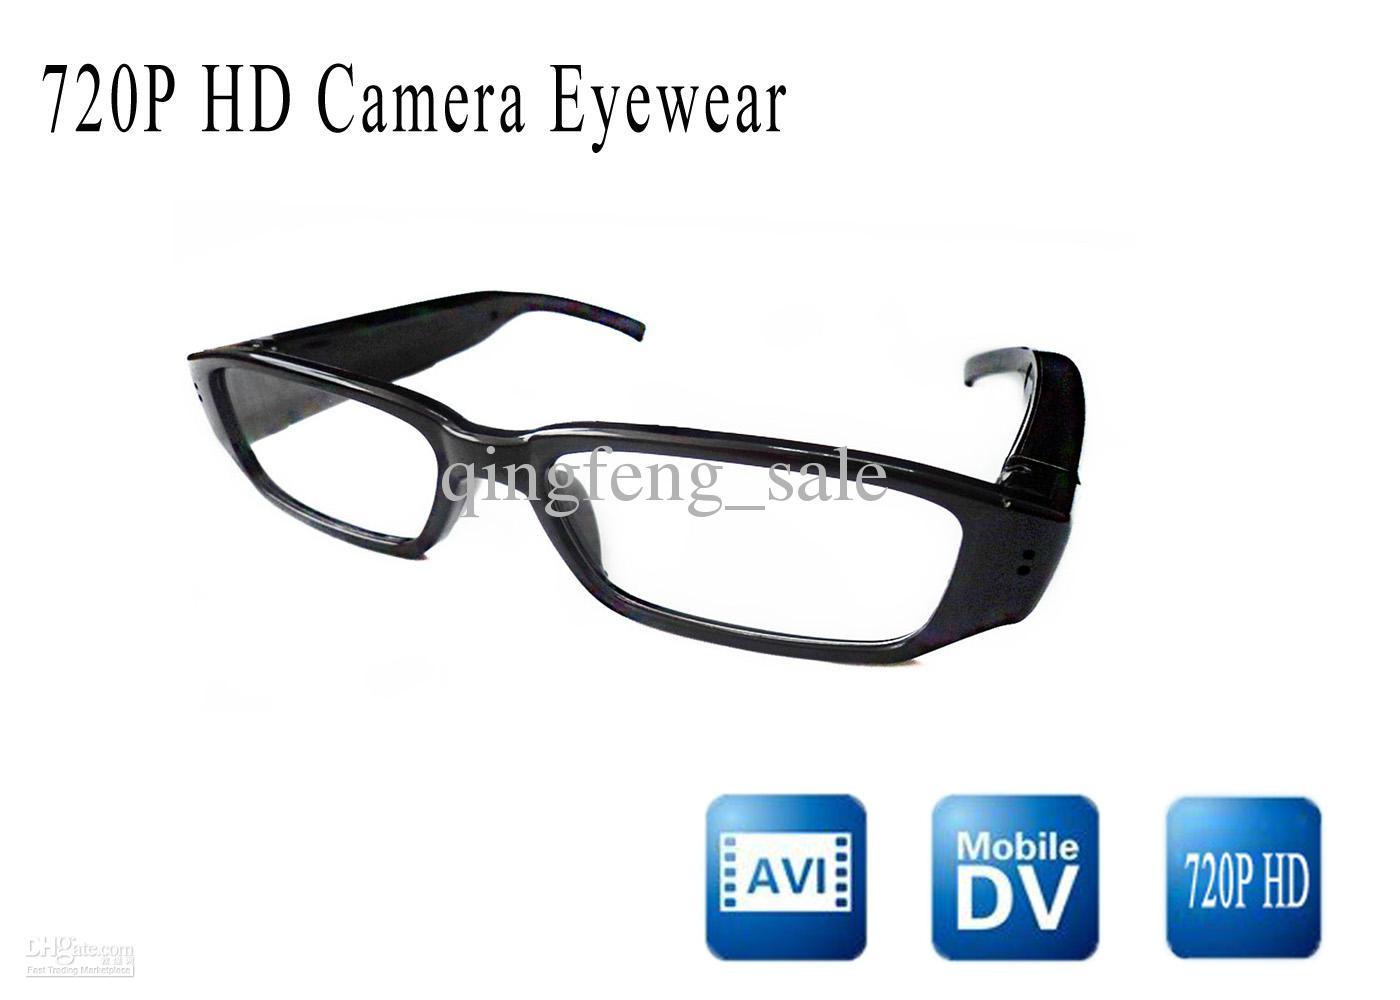 92872f81c05 2019 Fashion Spy 720P HD Video Glasses Pinhole Hidden Camera Eyewear Mini  Glass Camera China PostF From Qingfeng sale